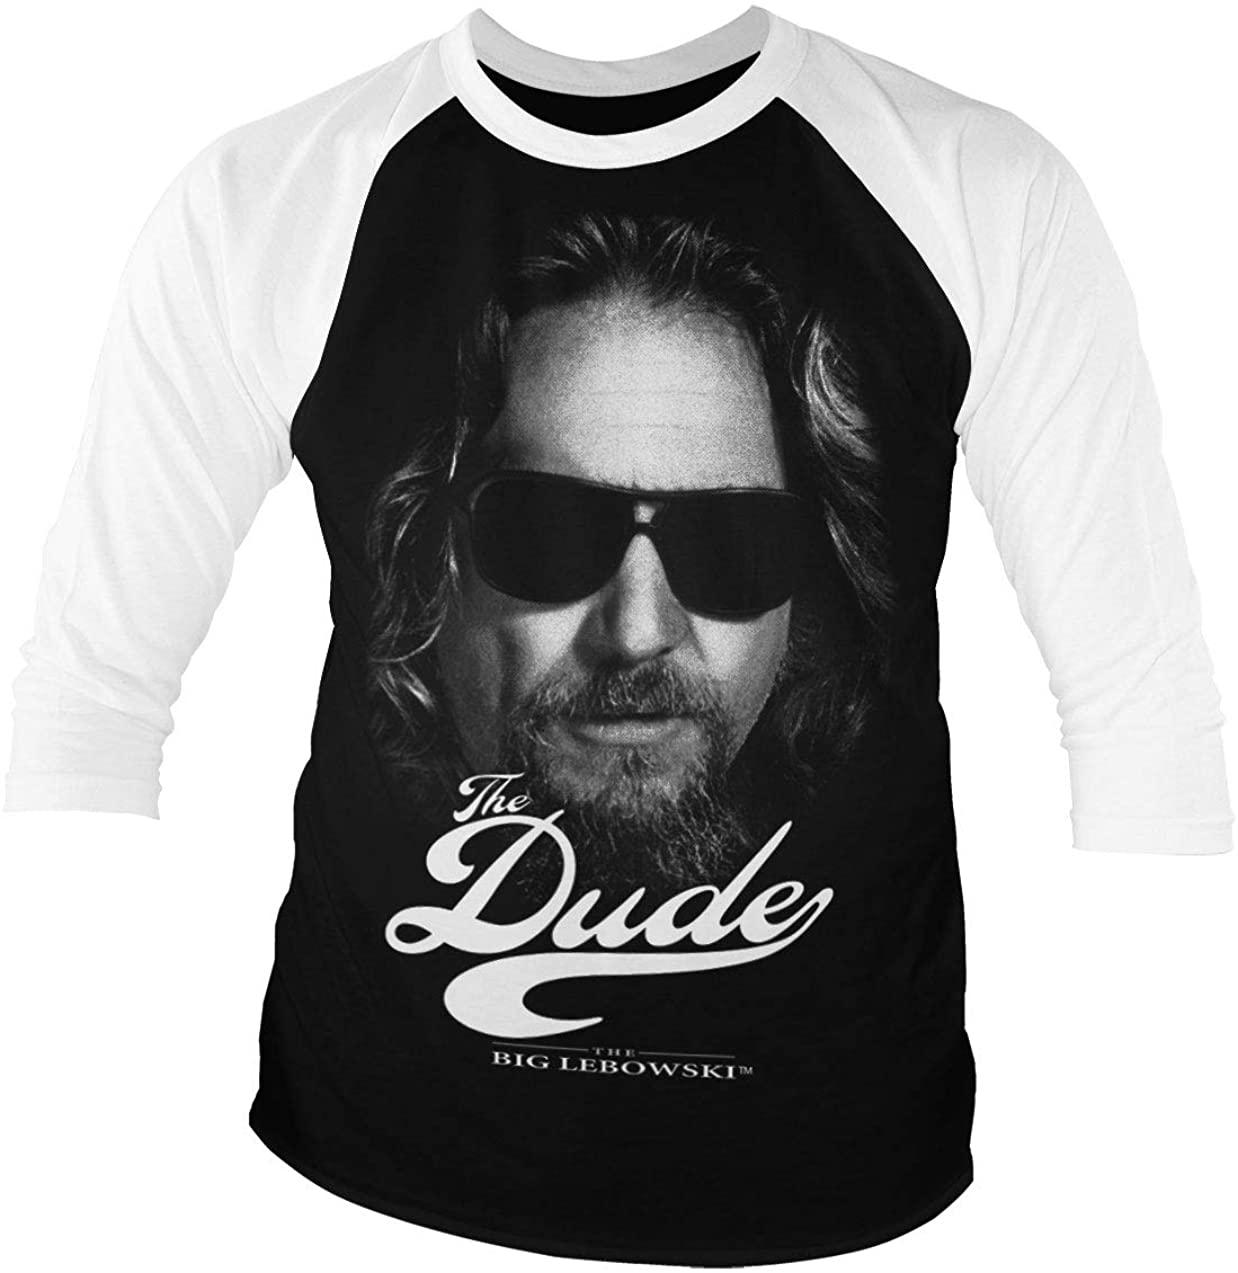 Officially Licensed The Dude II Baseball 3/4 Sleeve T-Shirt (Black-White)